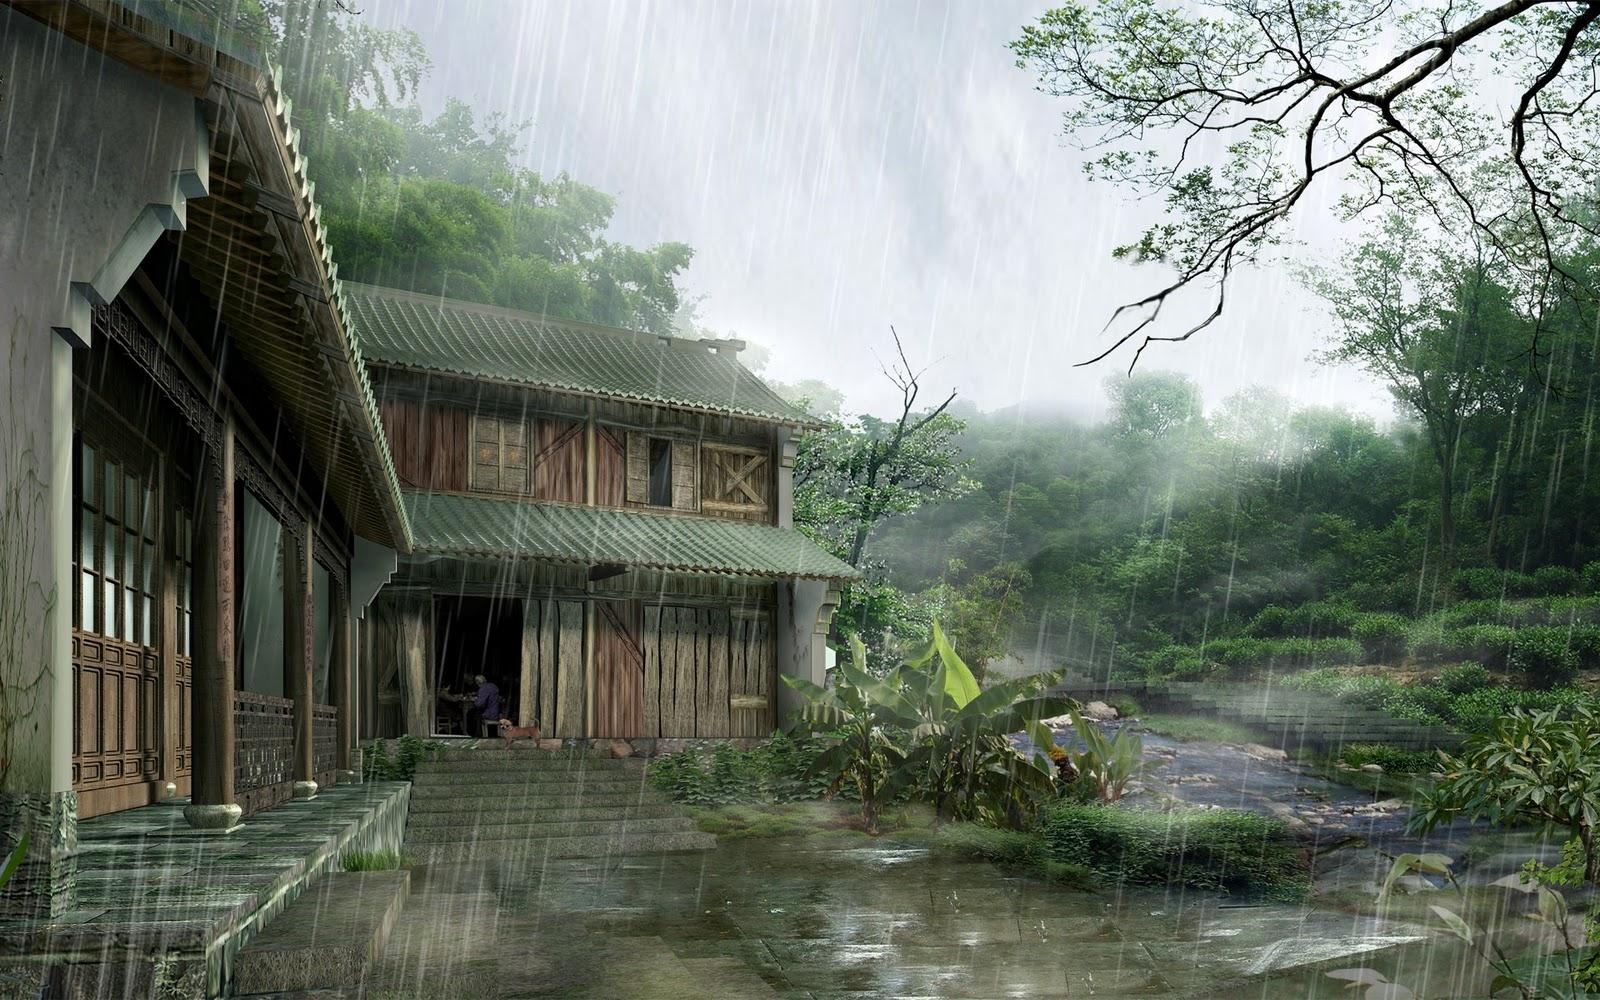 http://1.bp.blogspot.com/_kRnqu-w9J50/TScbOTqW05I/AAAAAAAAADM/7-gbs_qlPpA/s1600/Japan_Digital_Landscape__04.jpg